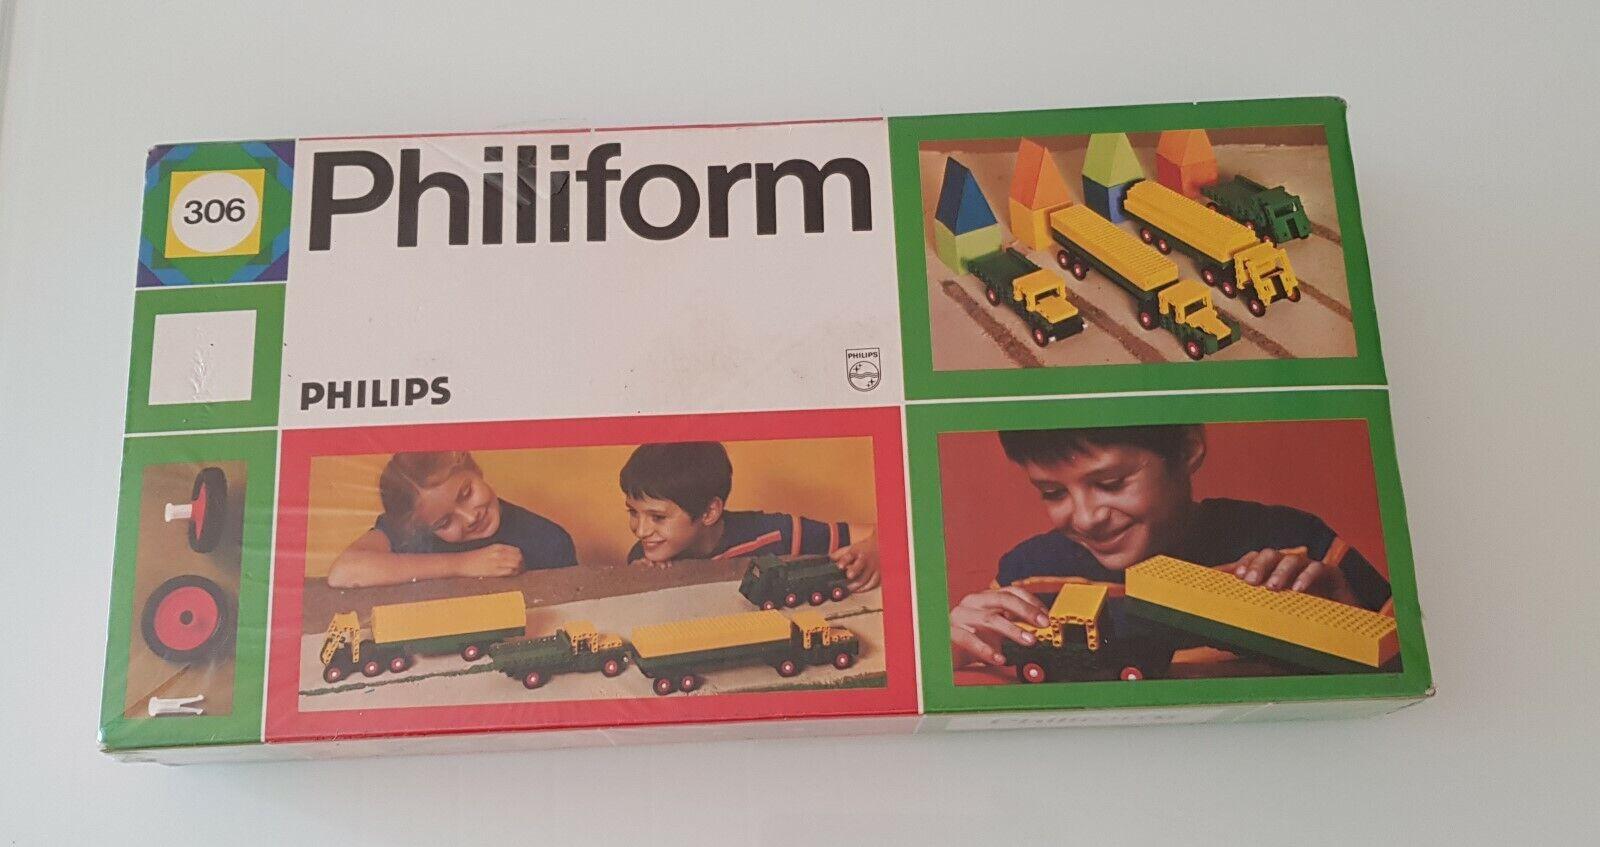 Philips Philiform 306 OVP New Rare Jahr LEGO 1960